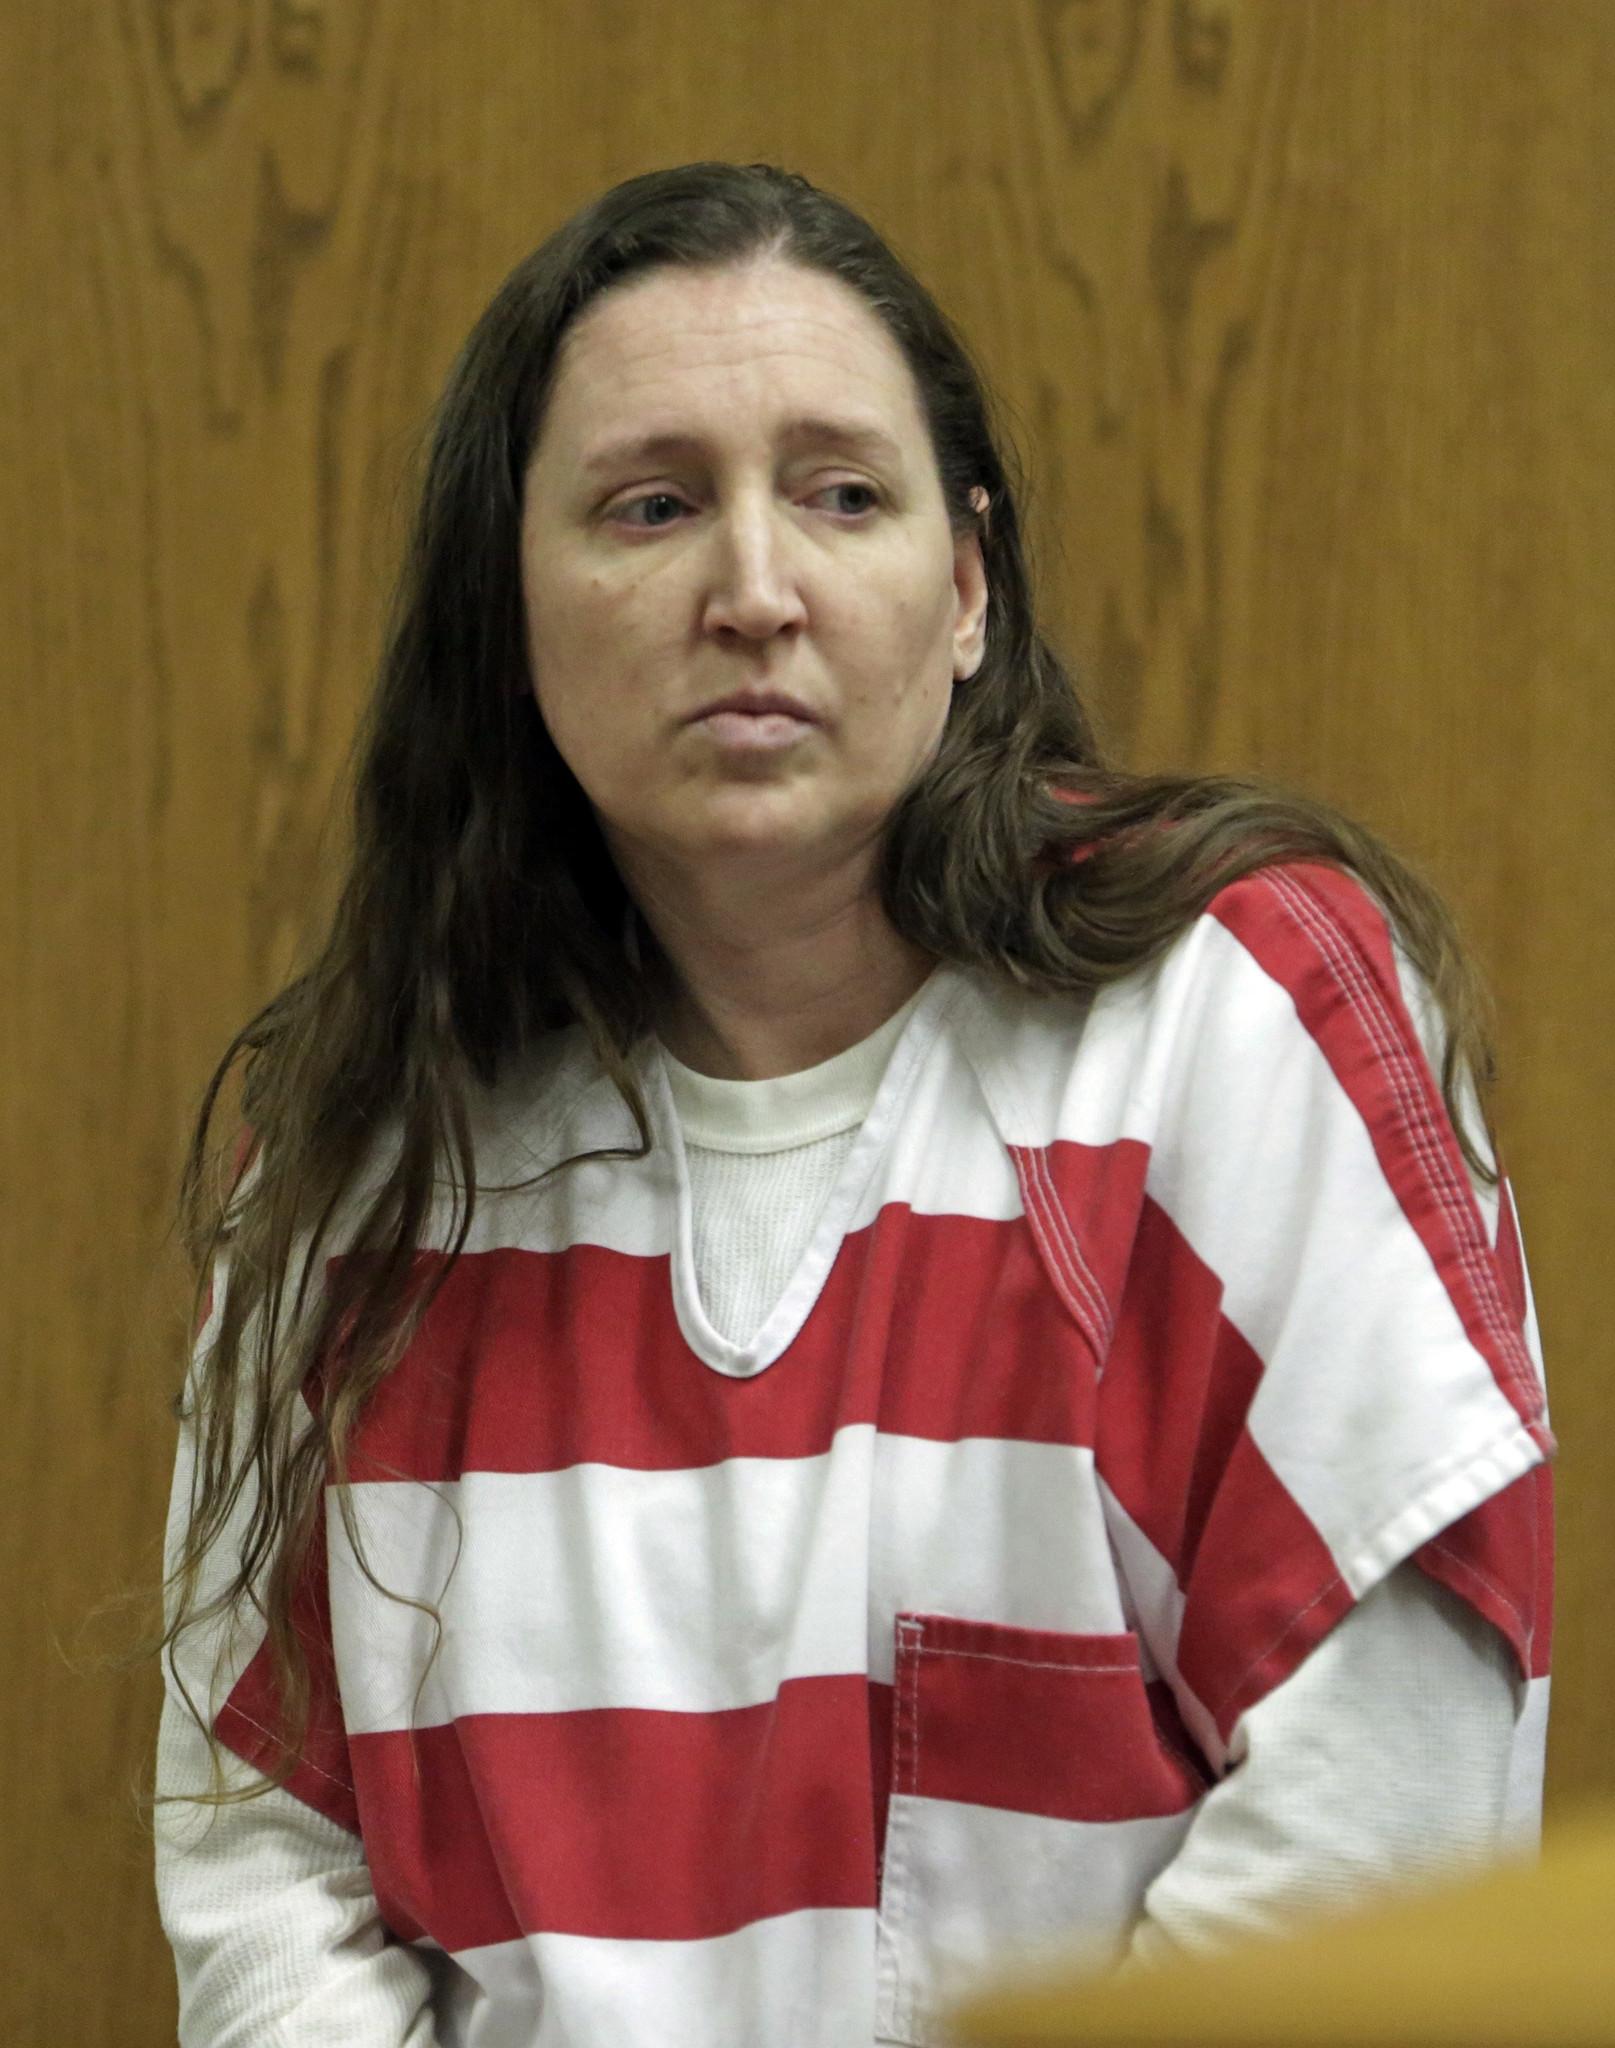 Utah mother pleads guilty to killing her six newborns